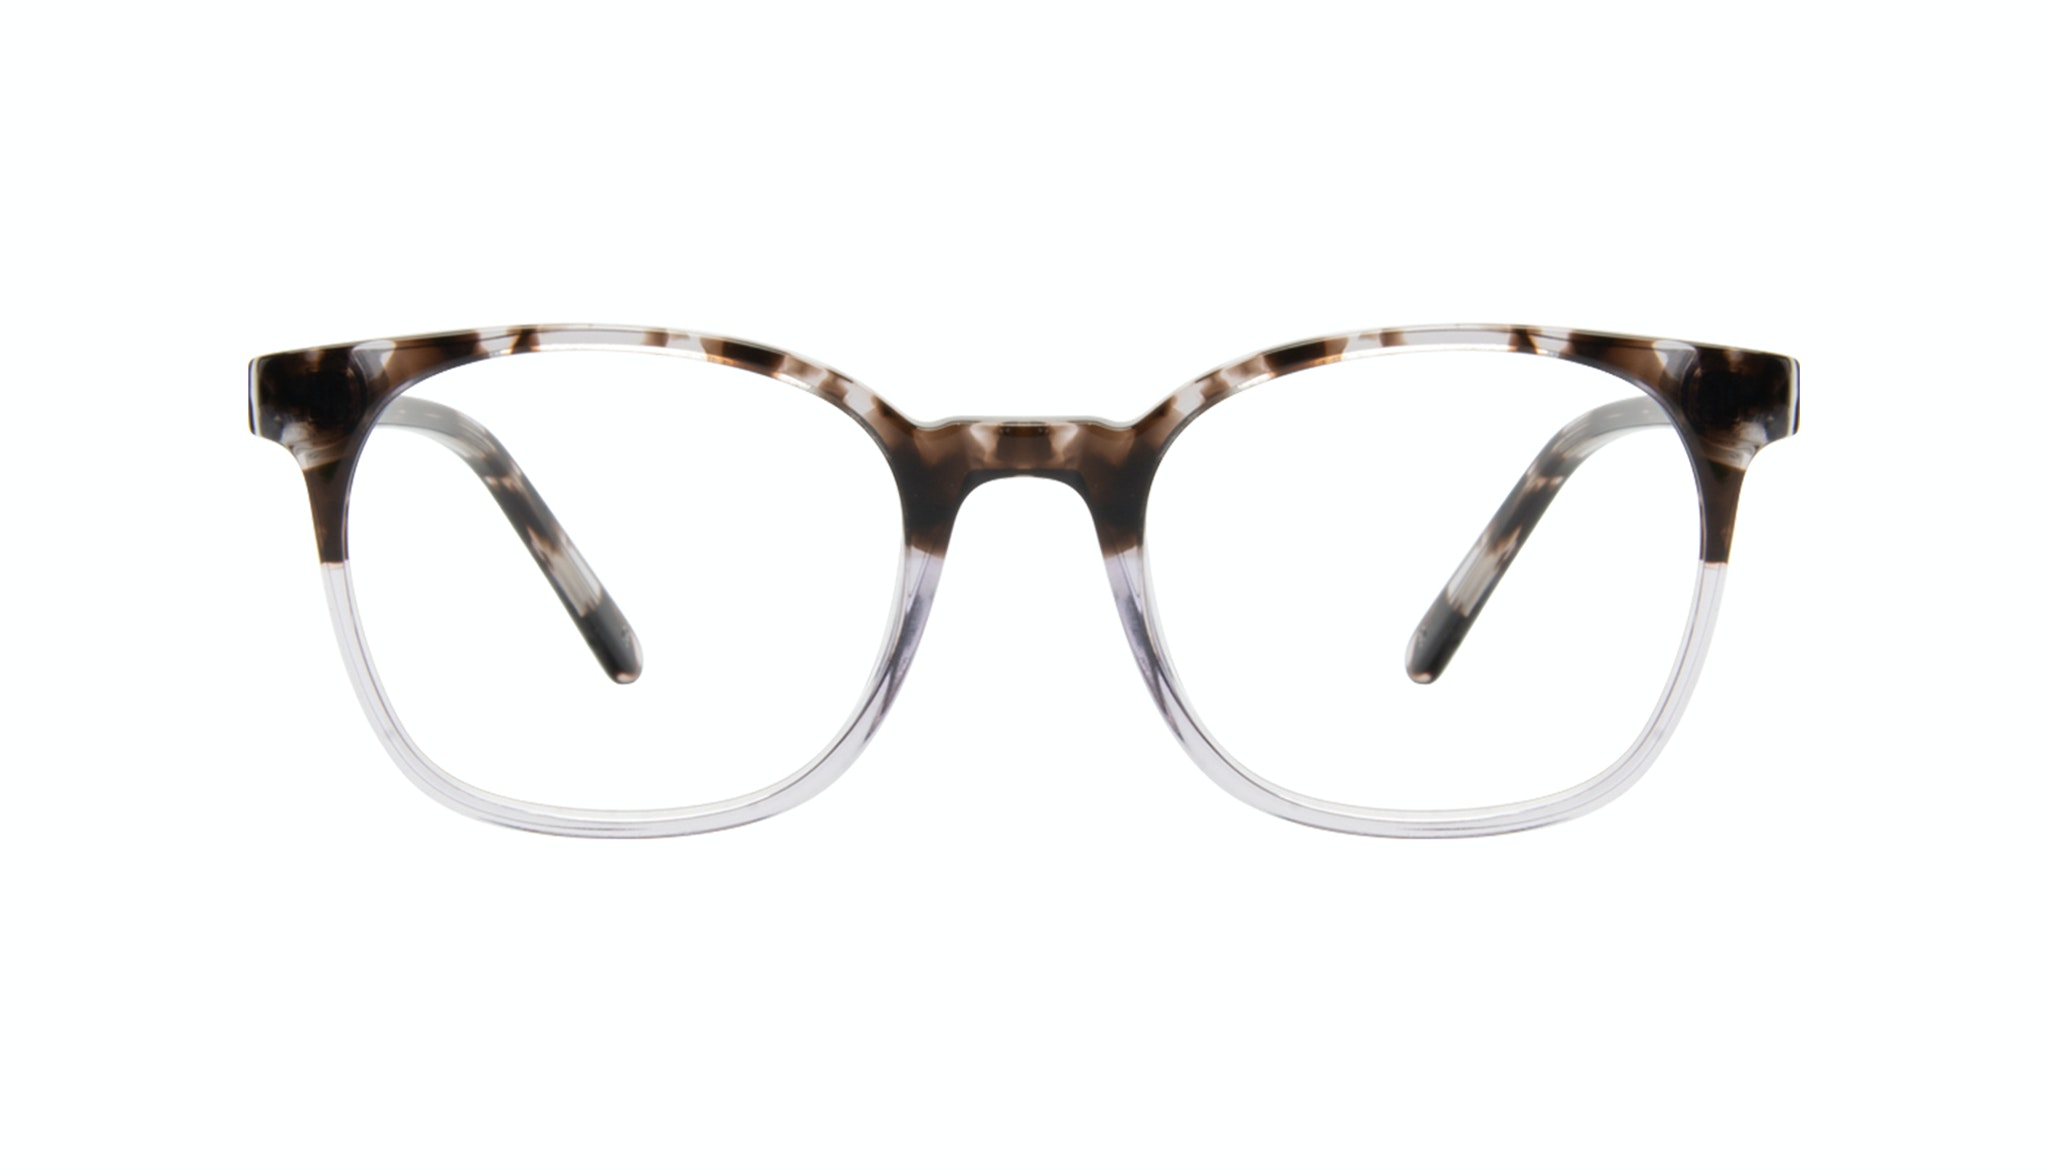 Affordable Fashion Glasses Rectangle Square Eyeglasses Men Peak Mocha Grey Front